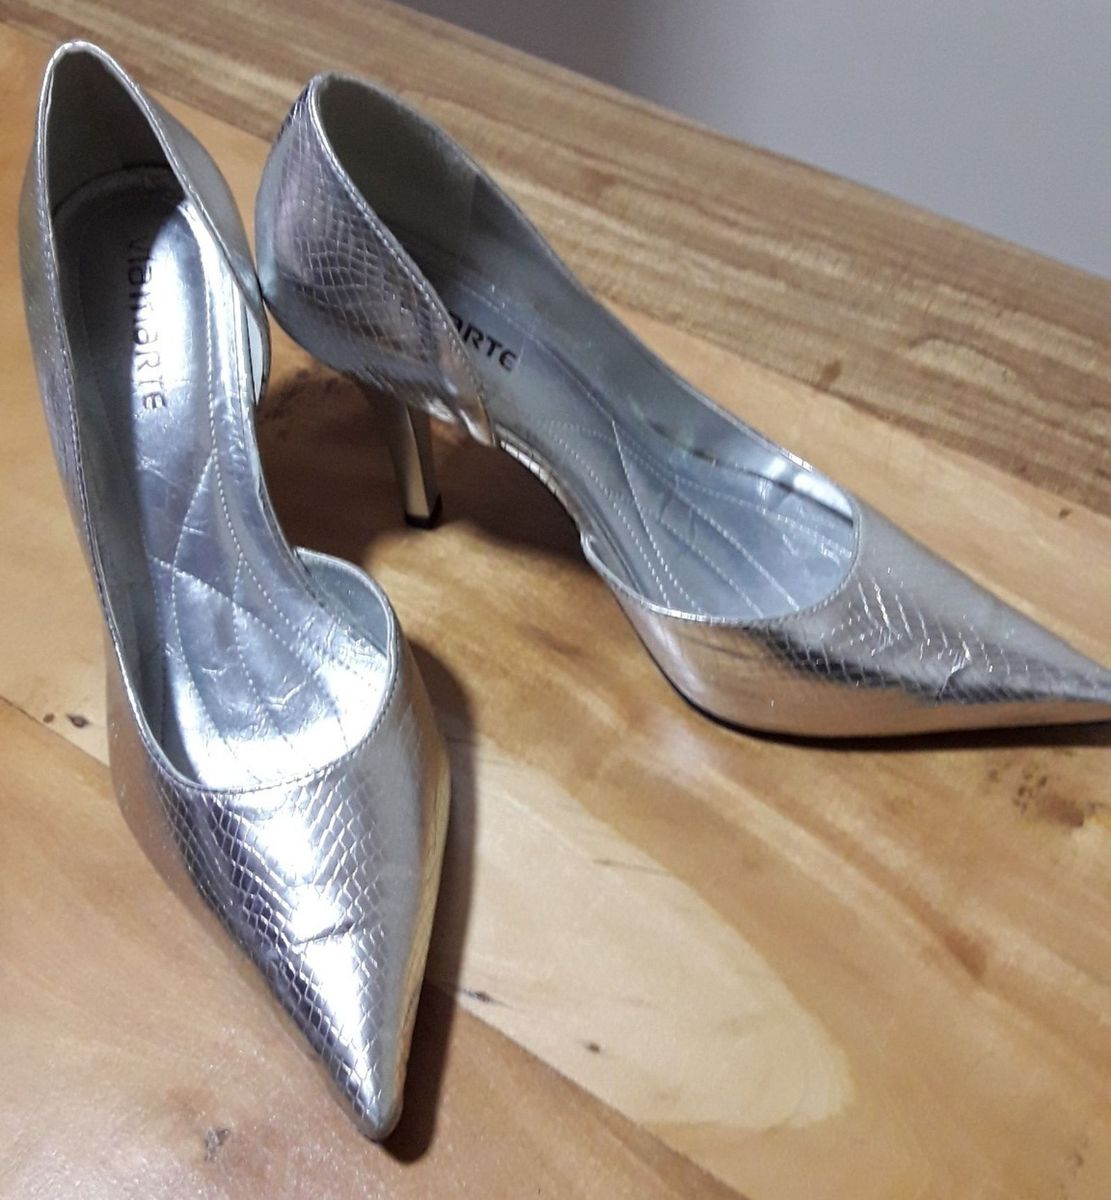 d528bebb1 scarpin prata - sapatos via marte.  Czm6ly9wag90b3muzw5qb2vplmnvbs5ici9wcm9kdwn0cy84ndq1nde1l2jhmzvkmmfimdcznziynmvjogy2ndnhndexoteyn2i3lmpwzw